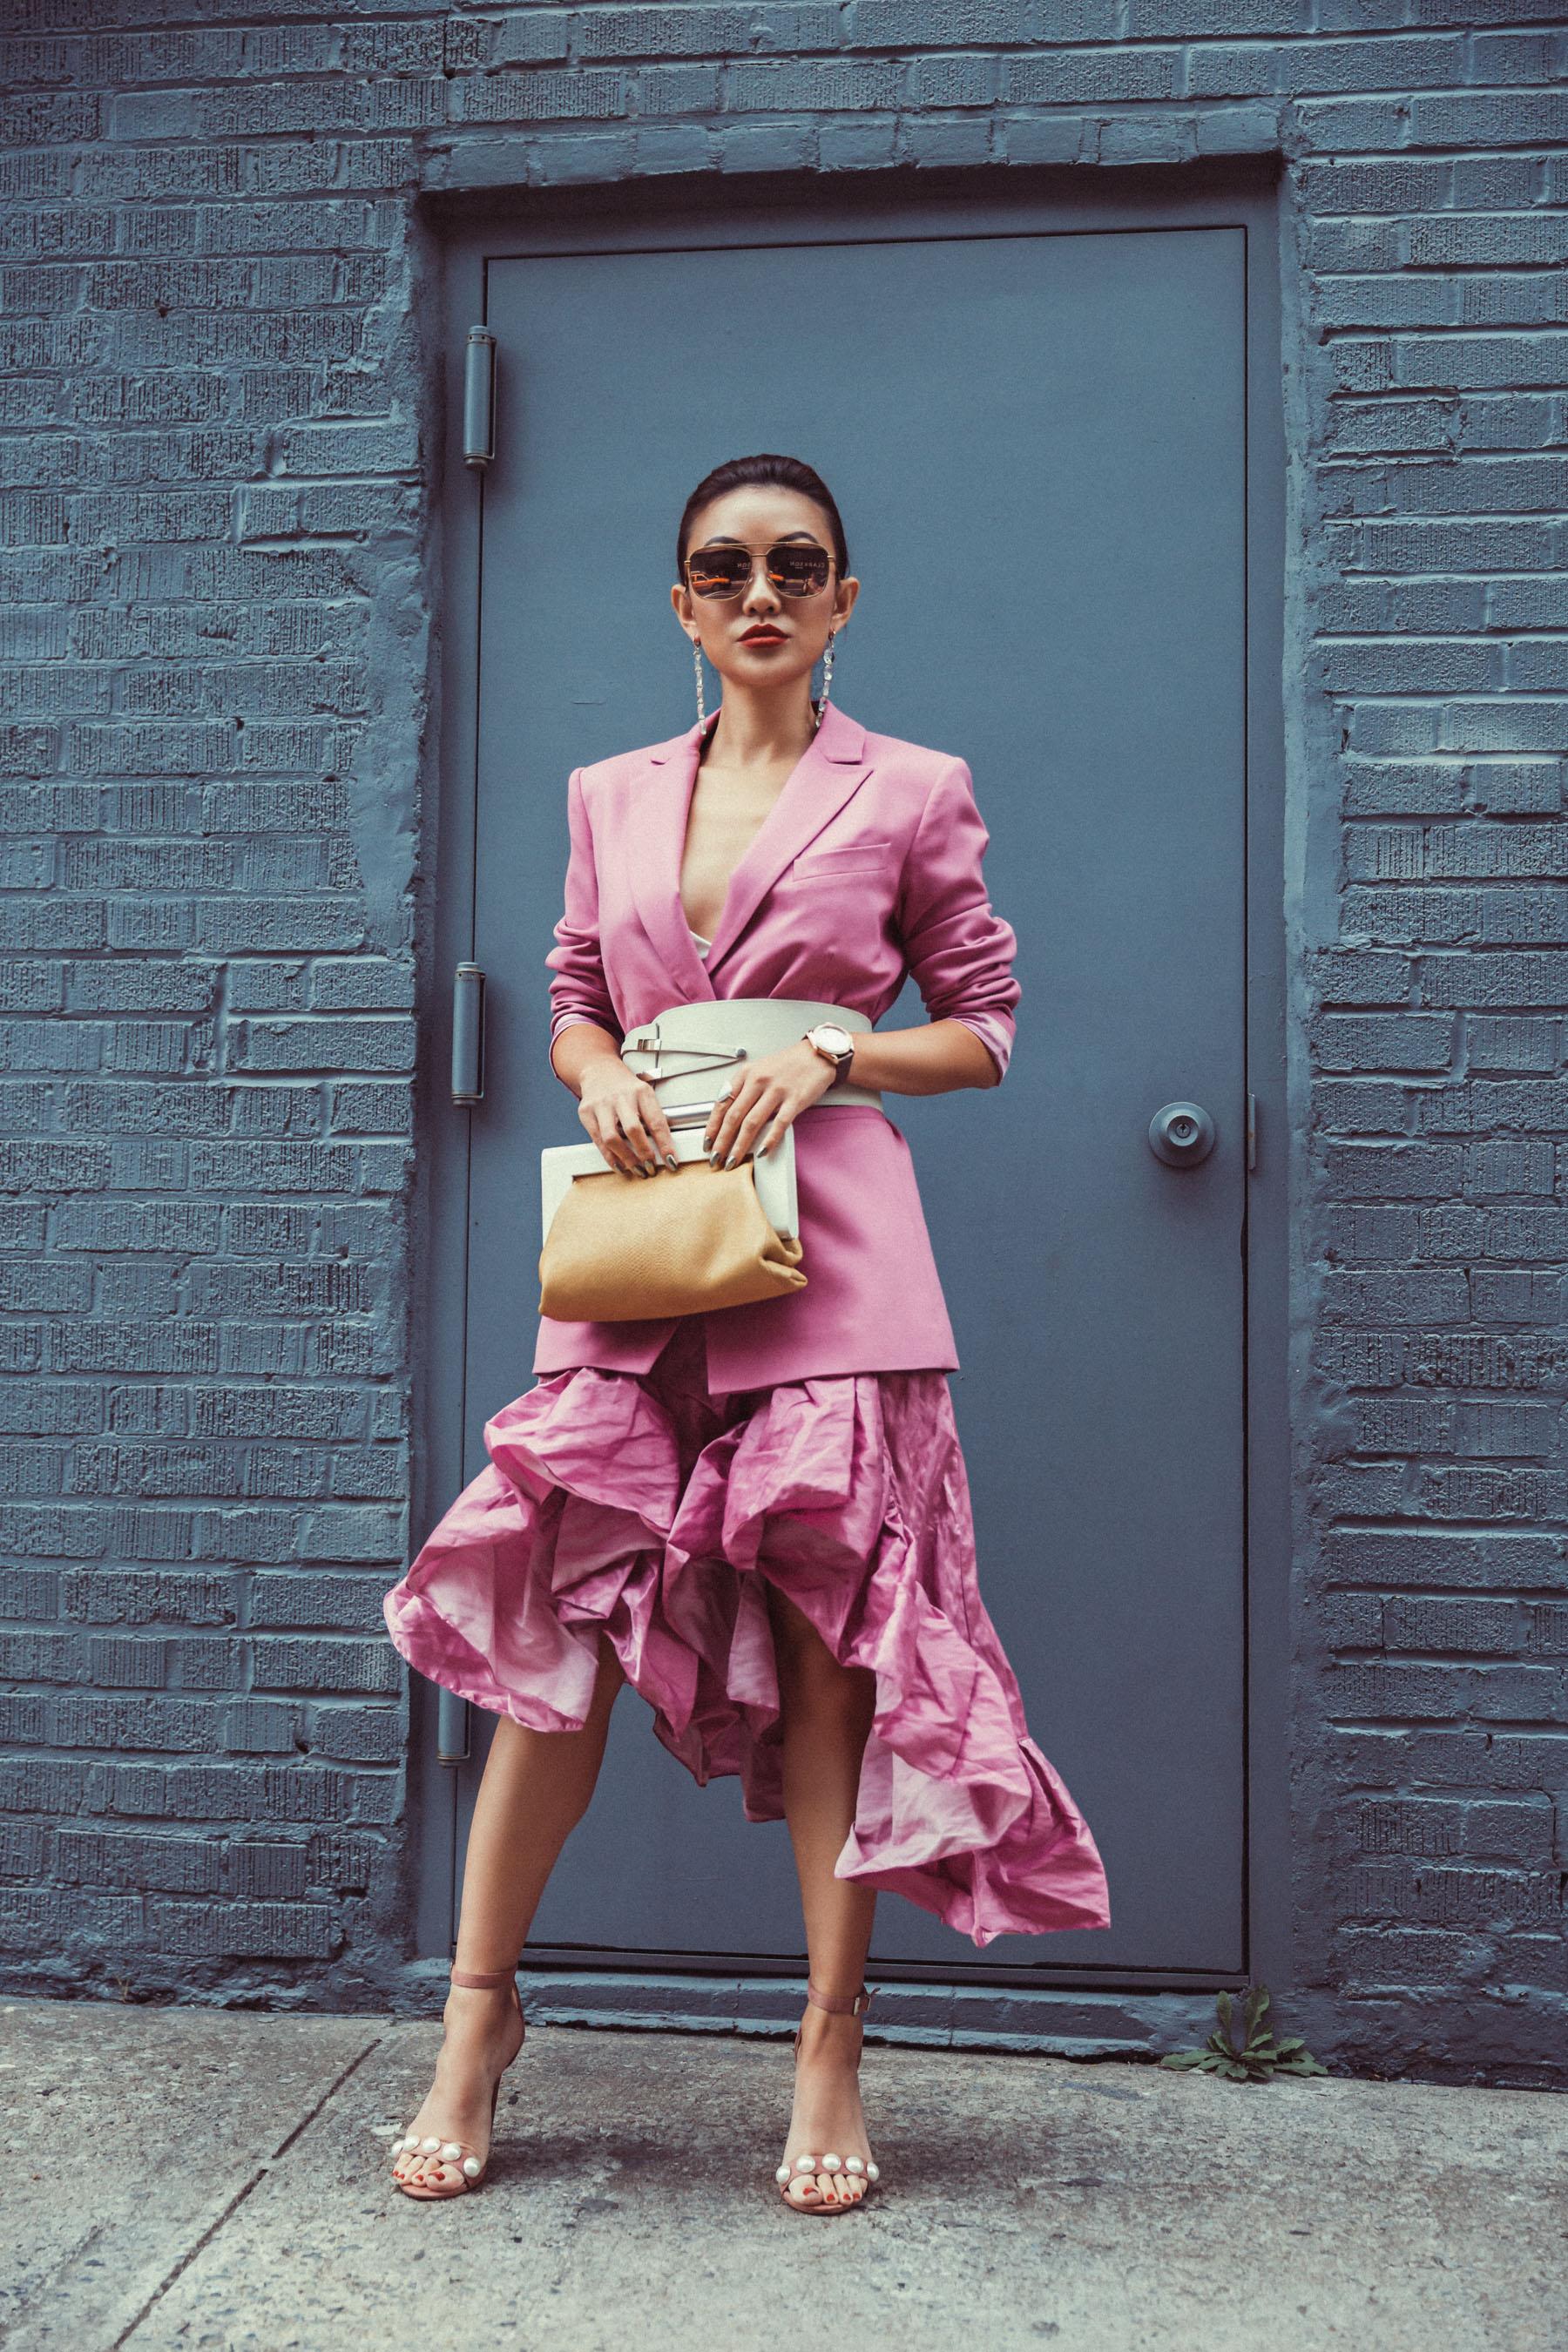 5 SPRING ACCESSORIES EVERYONE WILL BE WEARING SOON // Notjessfashion.com // waist belt, belted blazer, ruffle dress, new york fashion week street style, fashion blogger street style, new york fashion blogger, asian blogger, top blogger